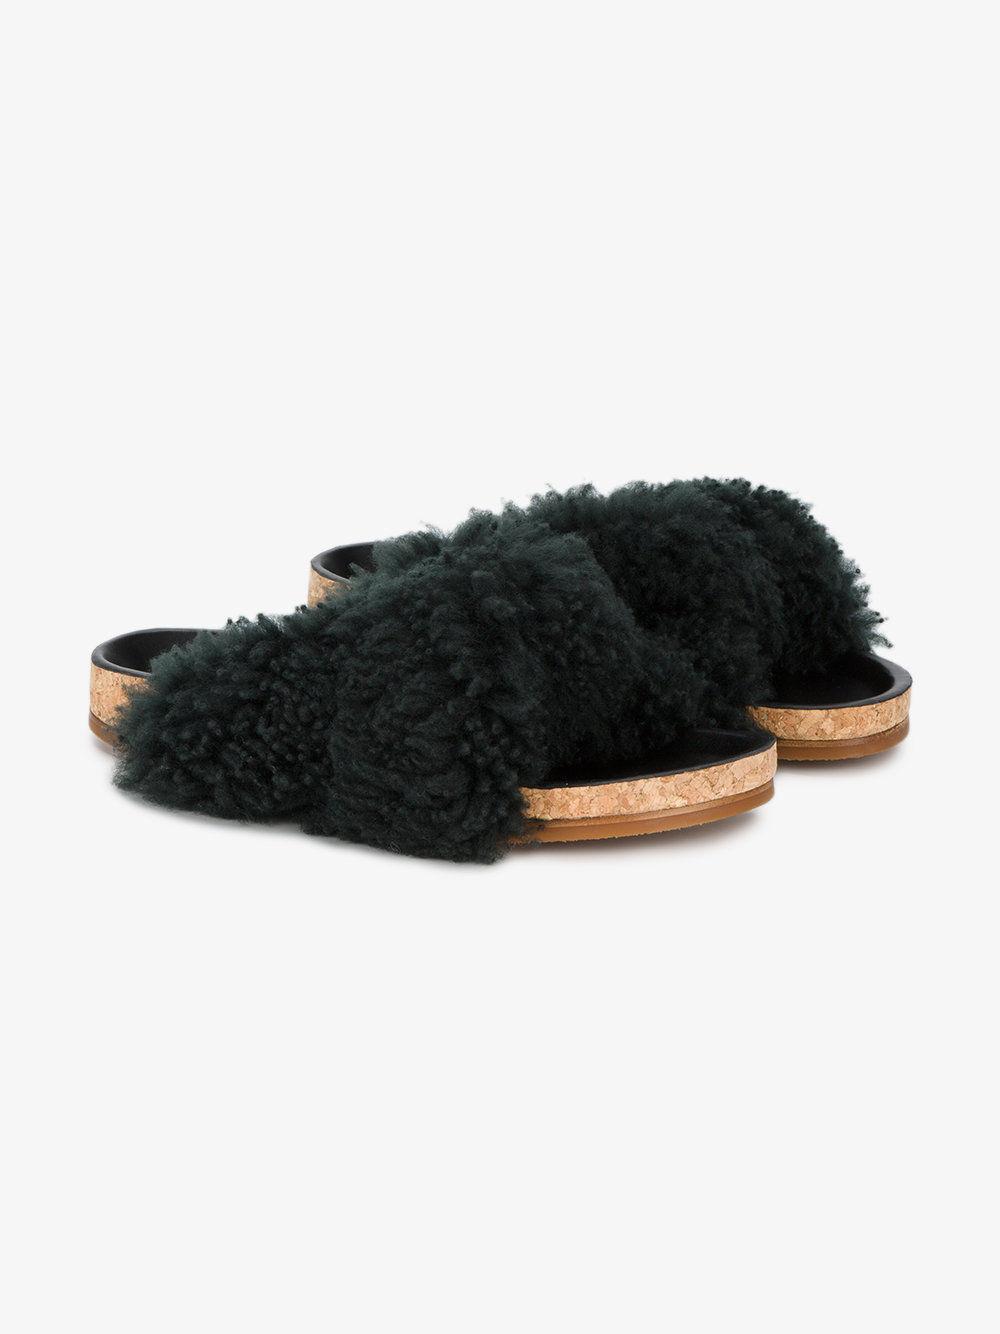 NUOVO CHLOE Karen plantare VERDE SCURO SHEARLING diapositive sandali-Taglia 35/